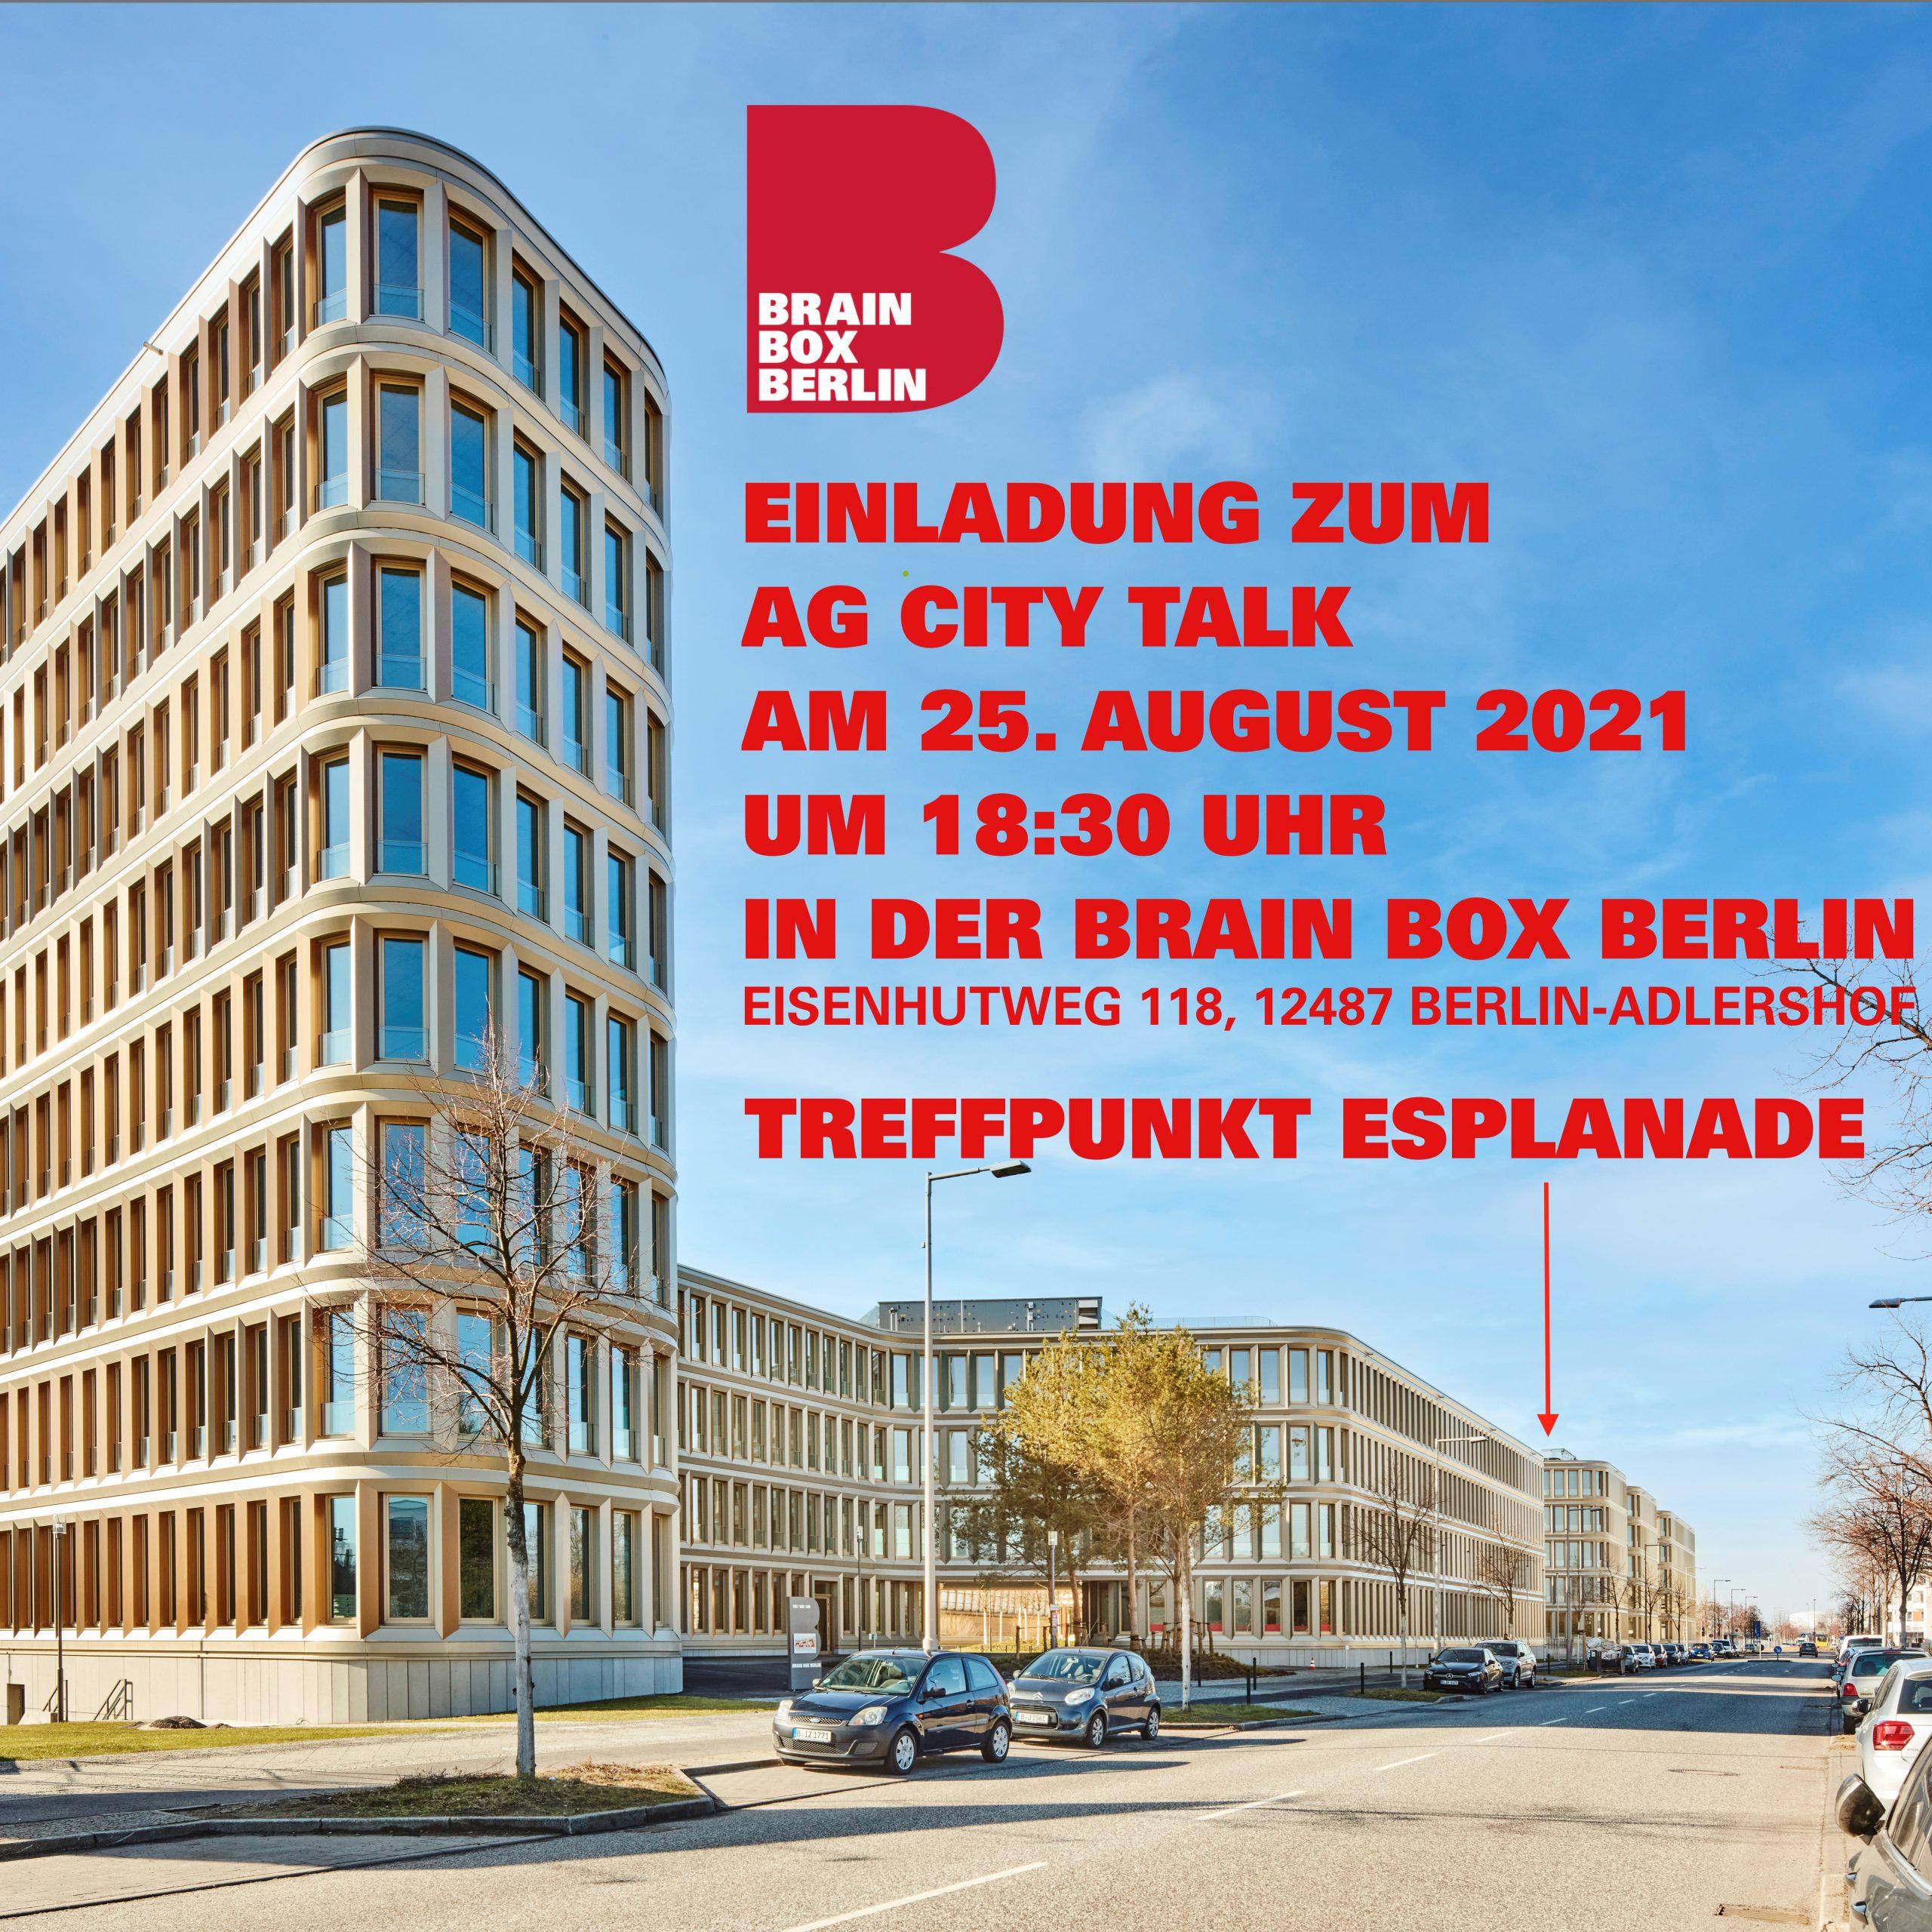 CITY TALK 25.08.2021 BRAIN BOX BERLIN